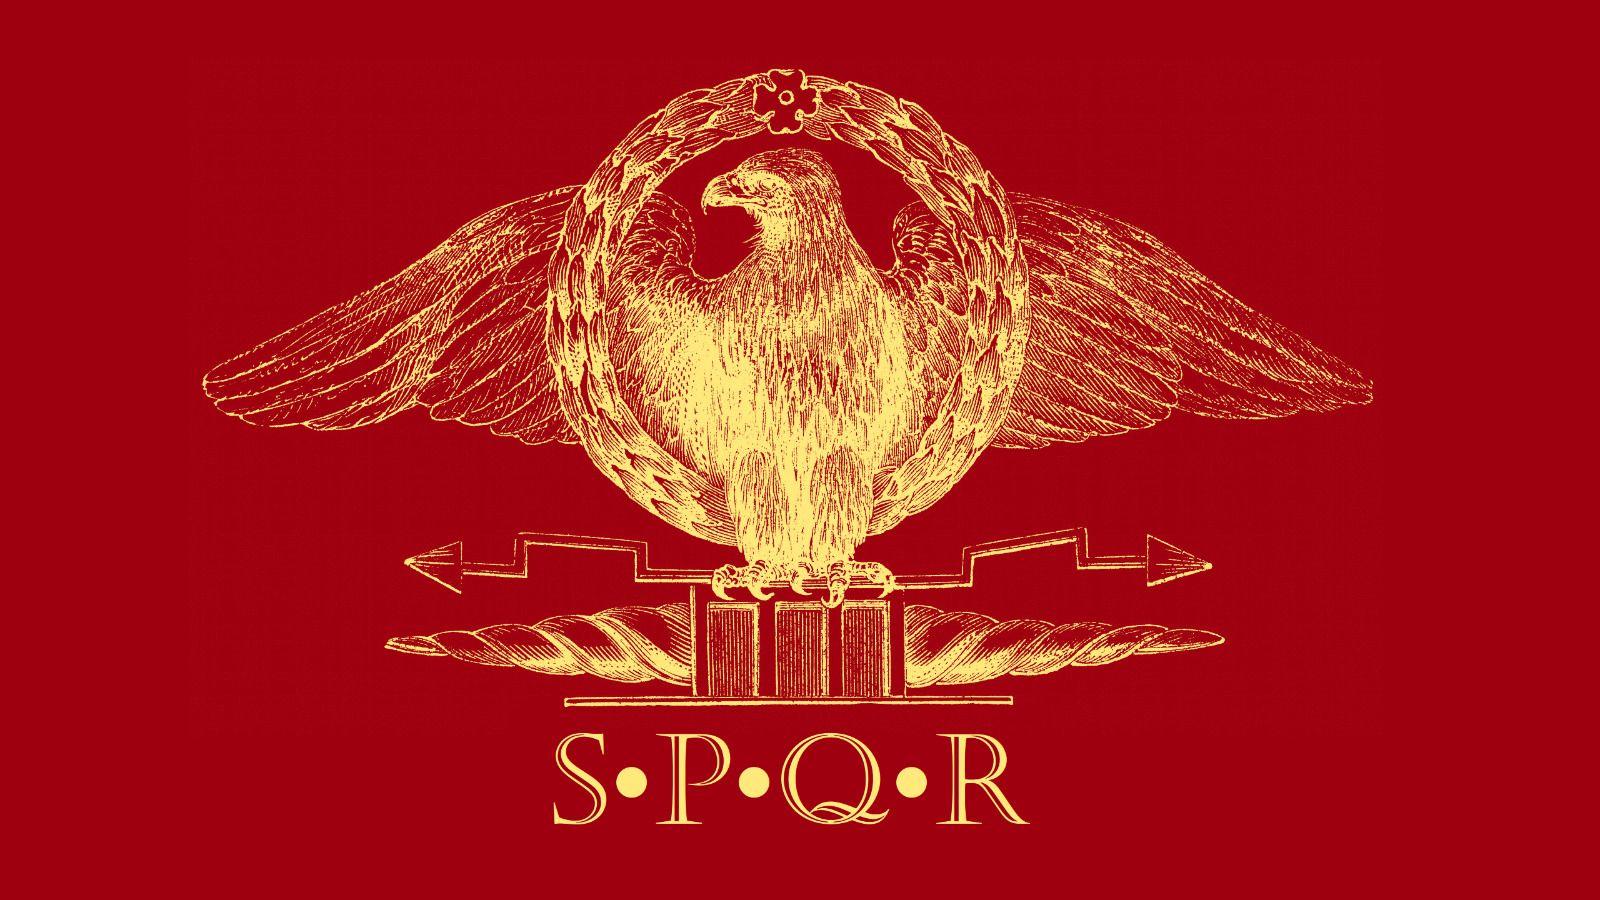 Roman Empire Senate And People Of Rome Flag Free Shipping 3x5ft 90x150cm Ebay Roman Empire Empire Logo Empire